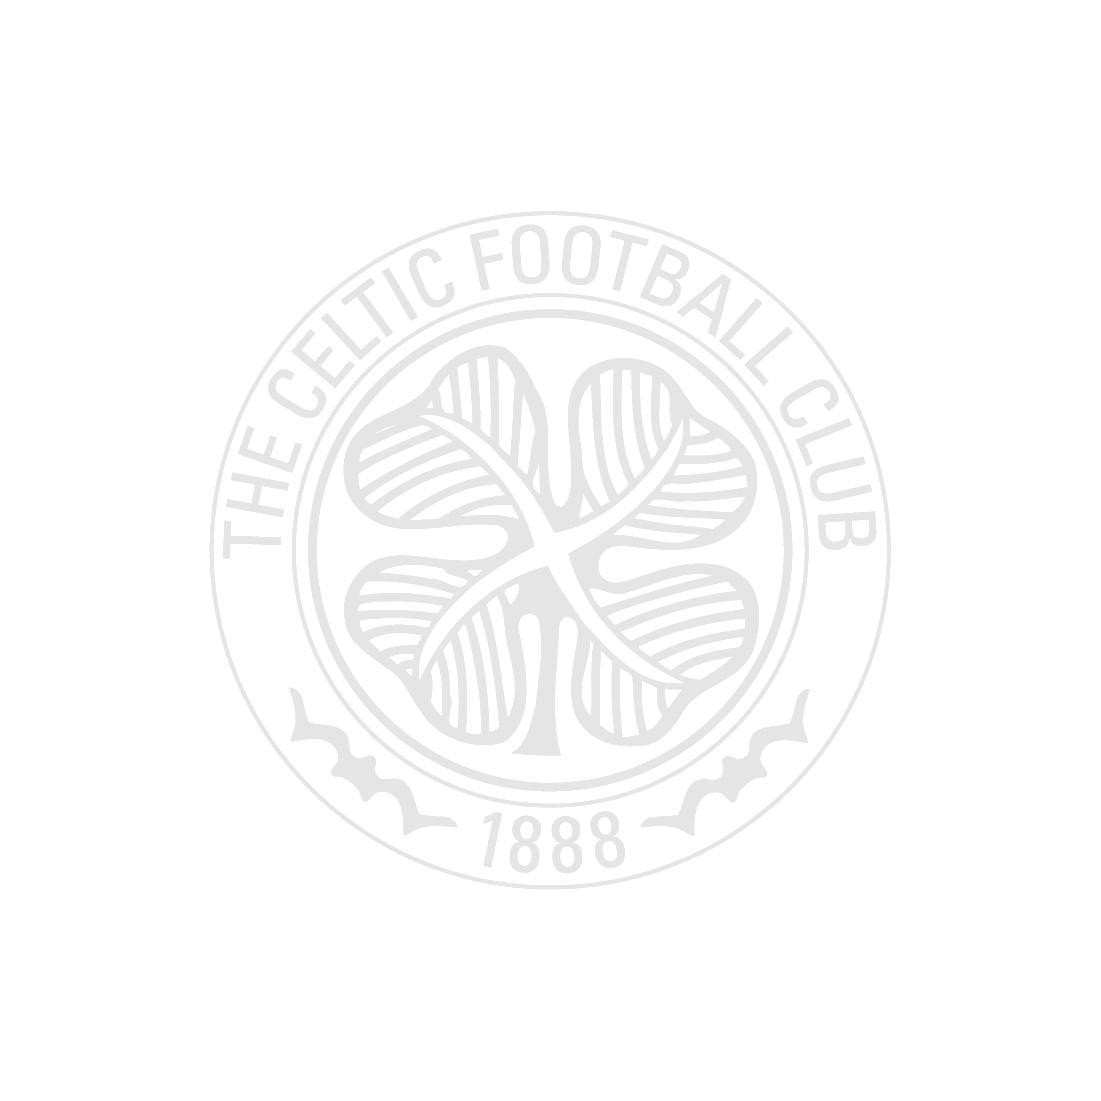 Celtic FC Jullien Autograph Photo Framed